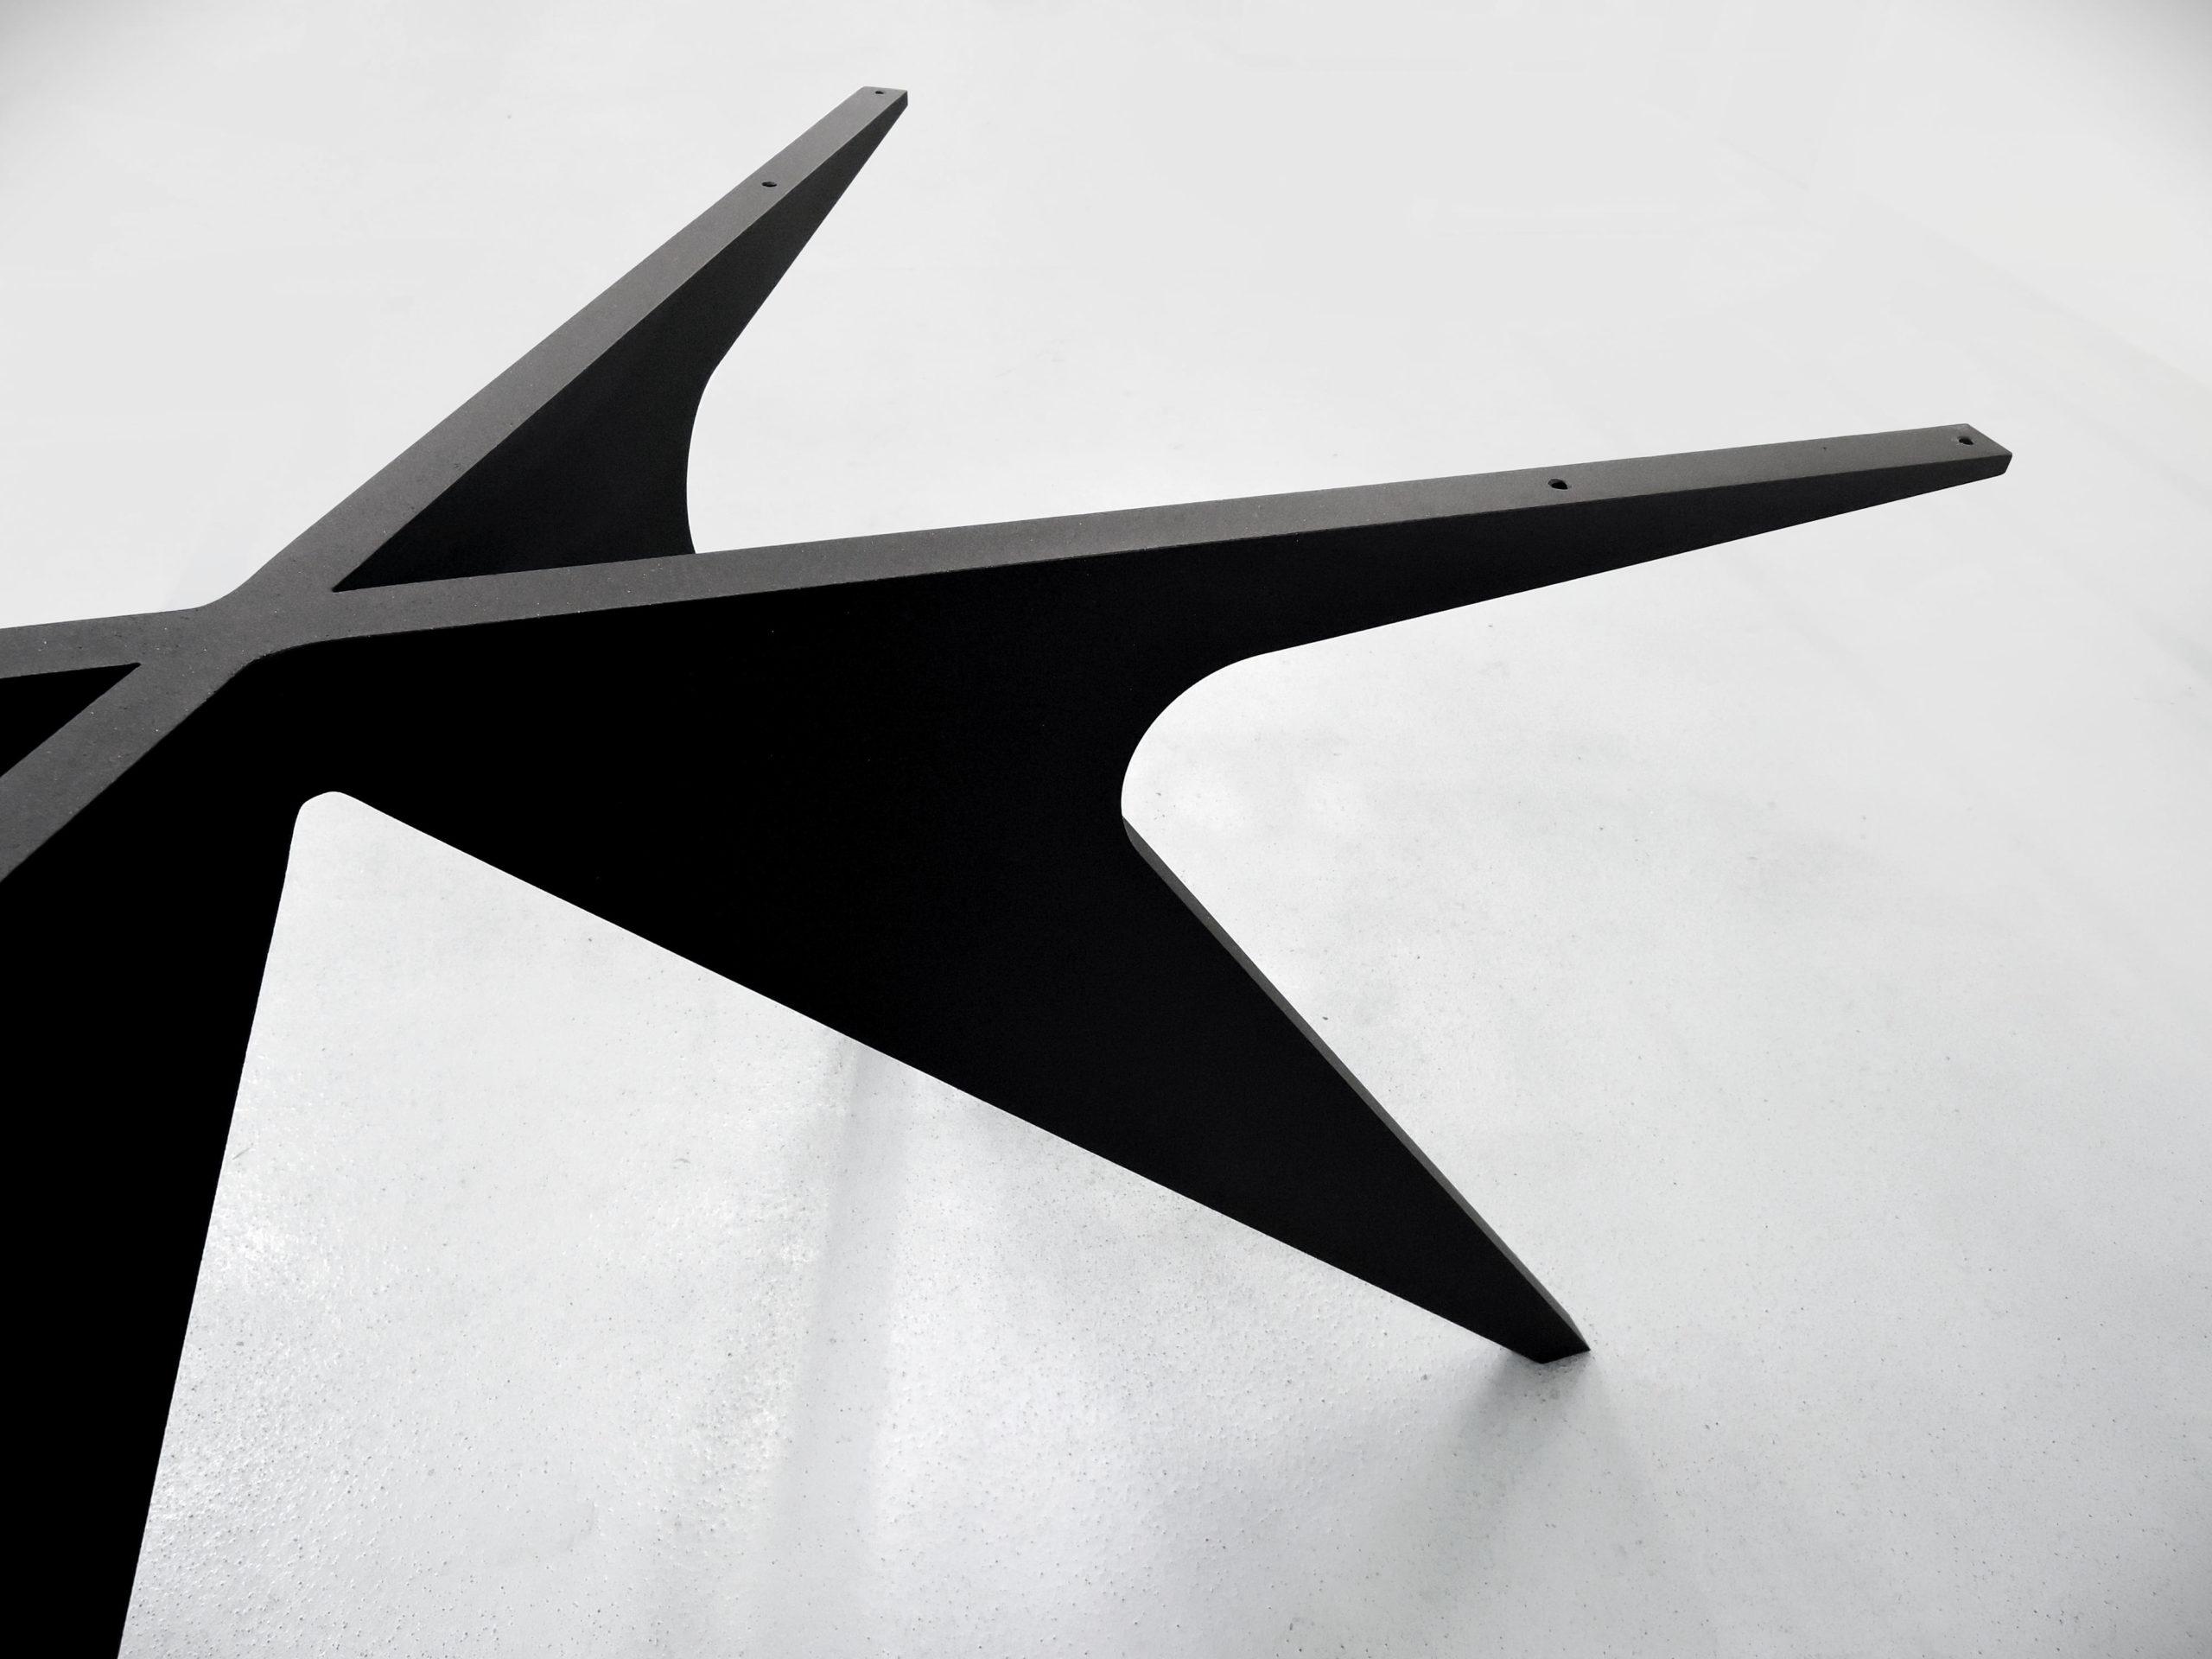 ARTMETA pied de table Méduse en aluminium sur mesure / Table Méduse